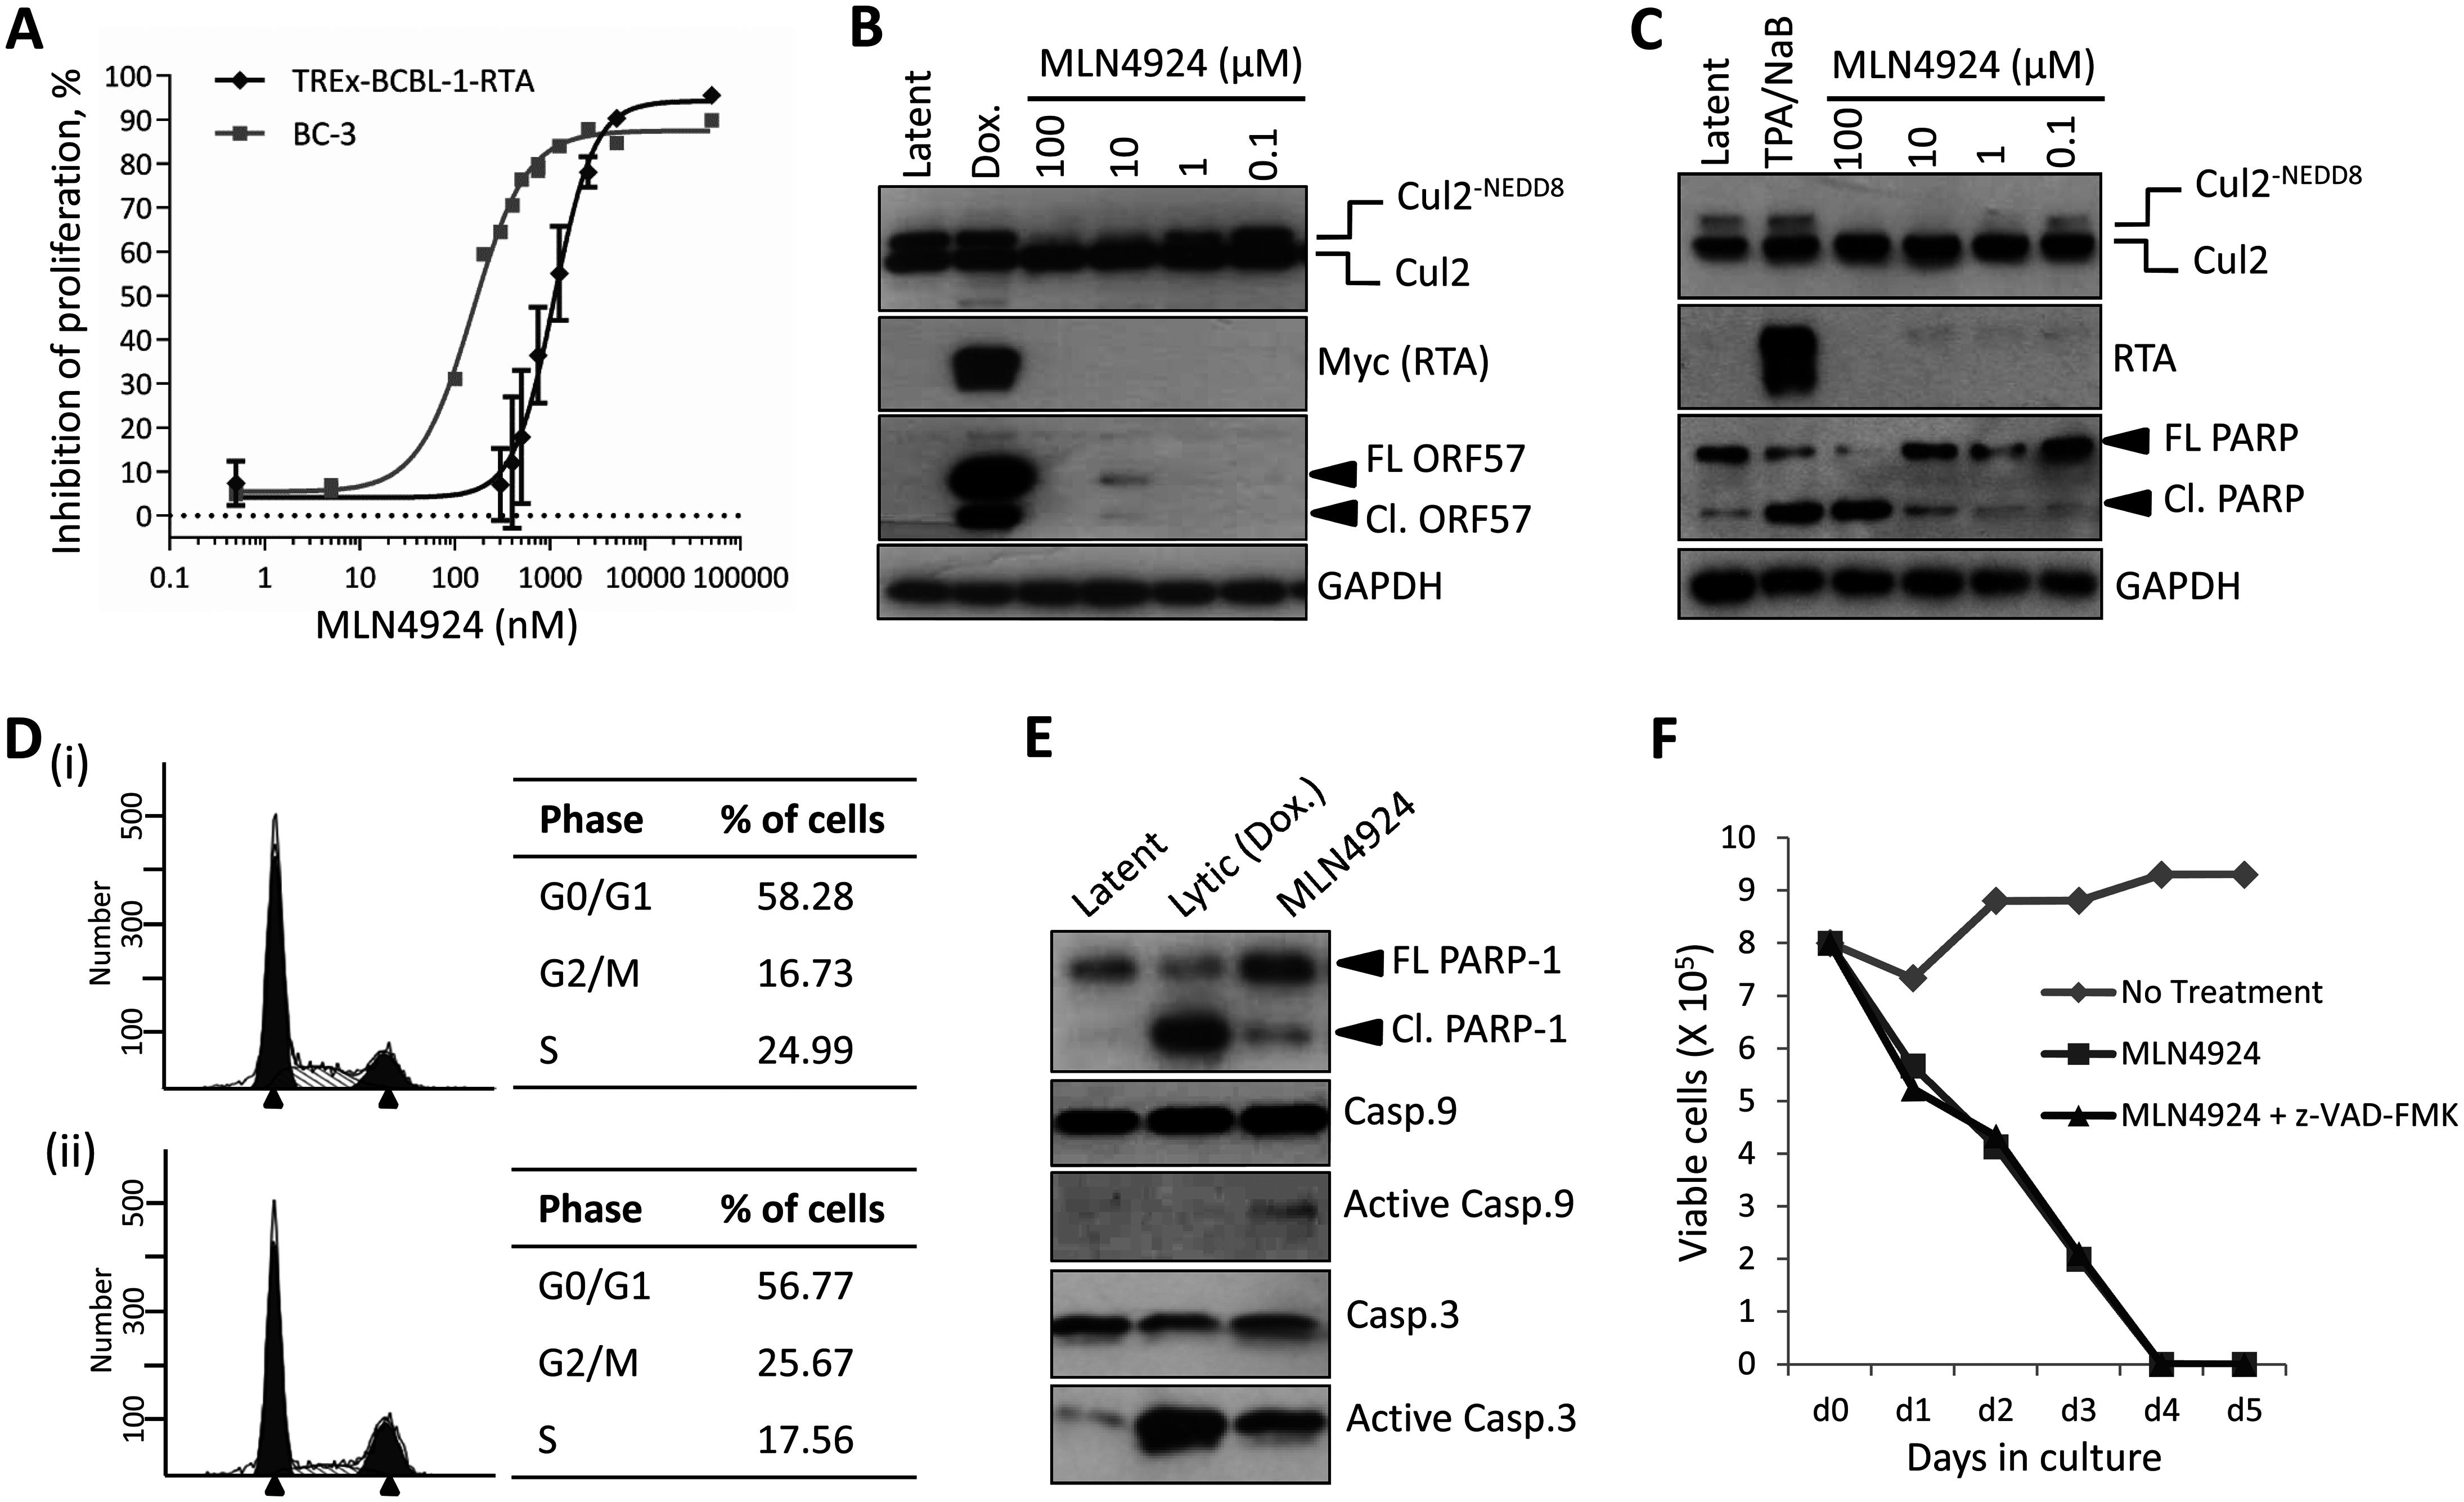 Inhibition of NEDDylation is cytotoxic in PEL cells.